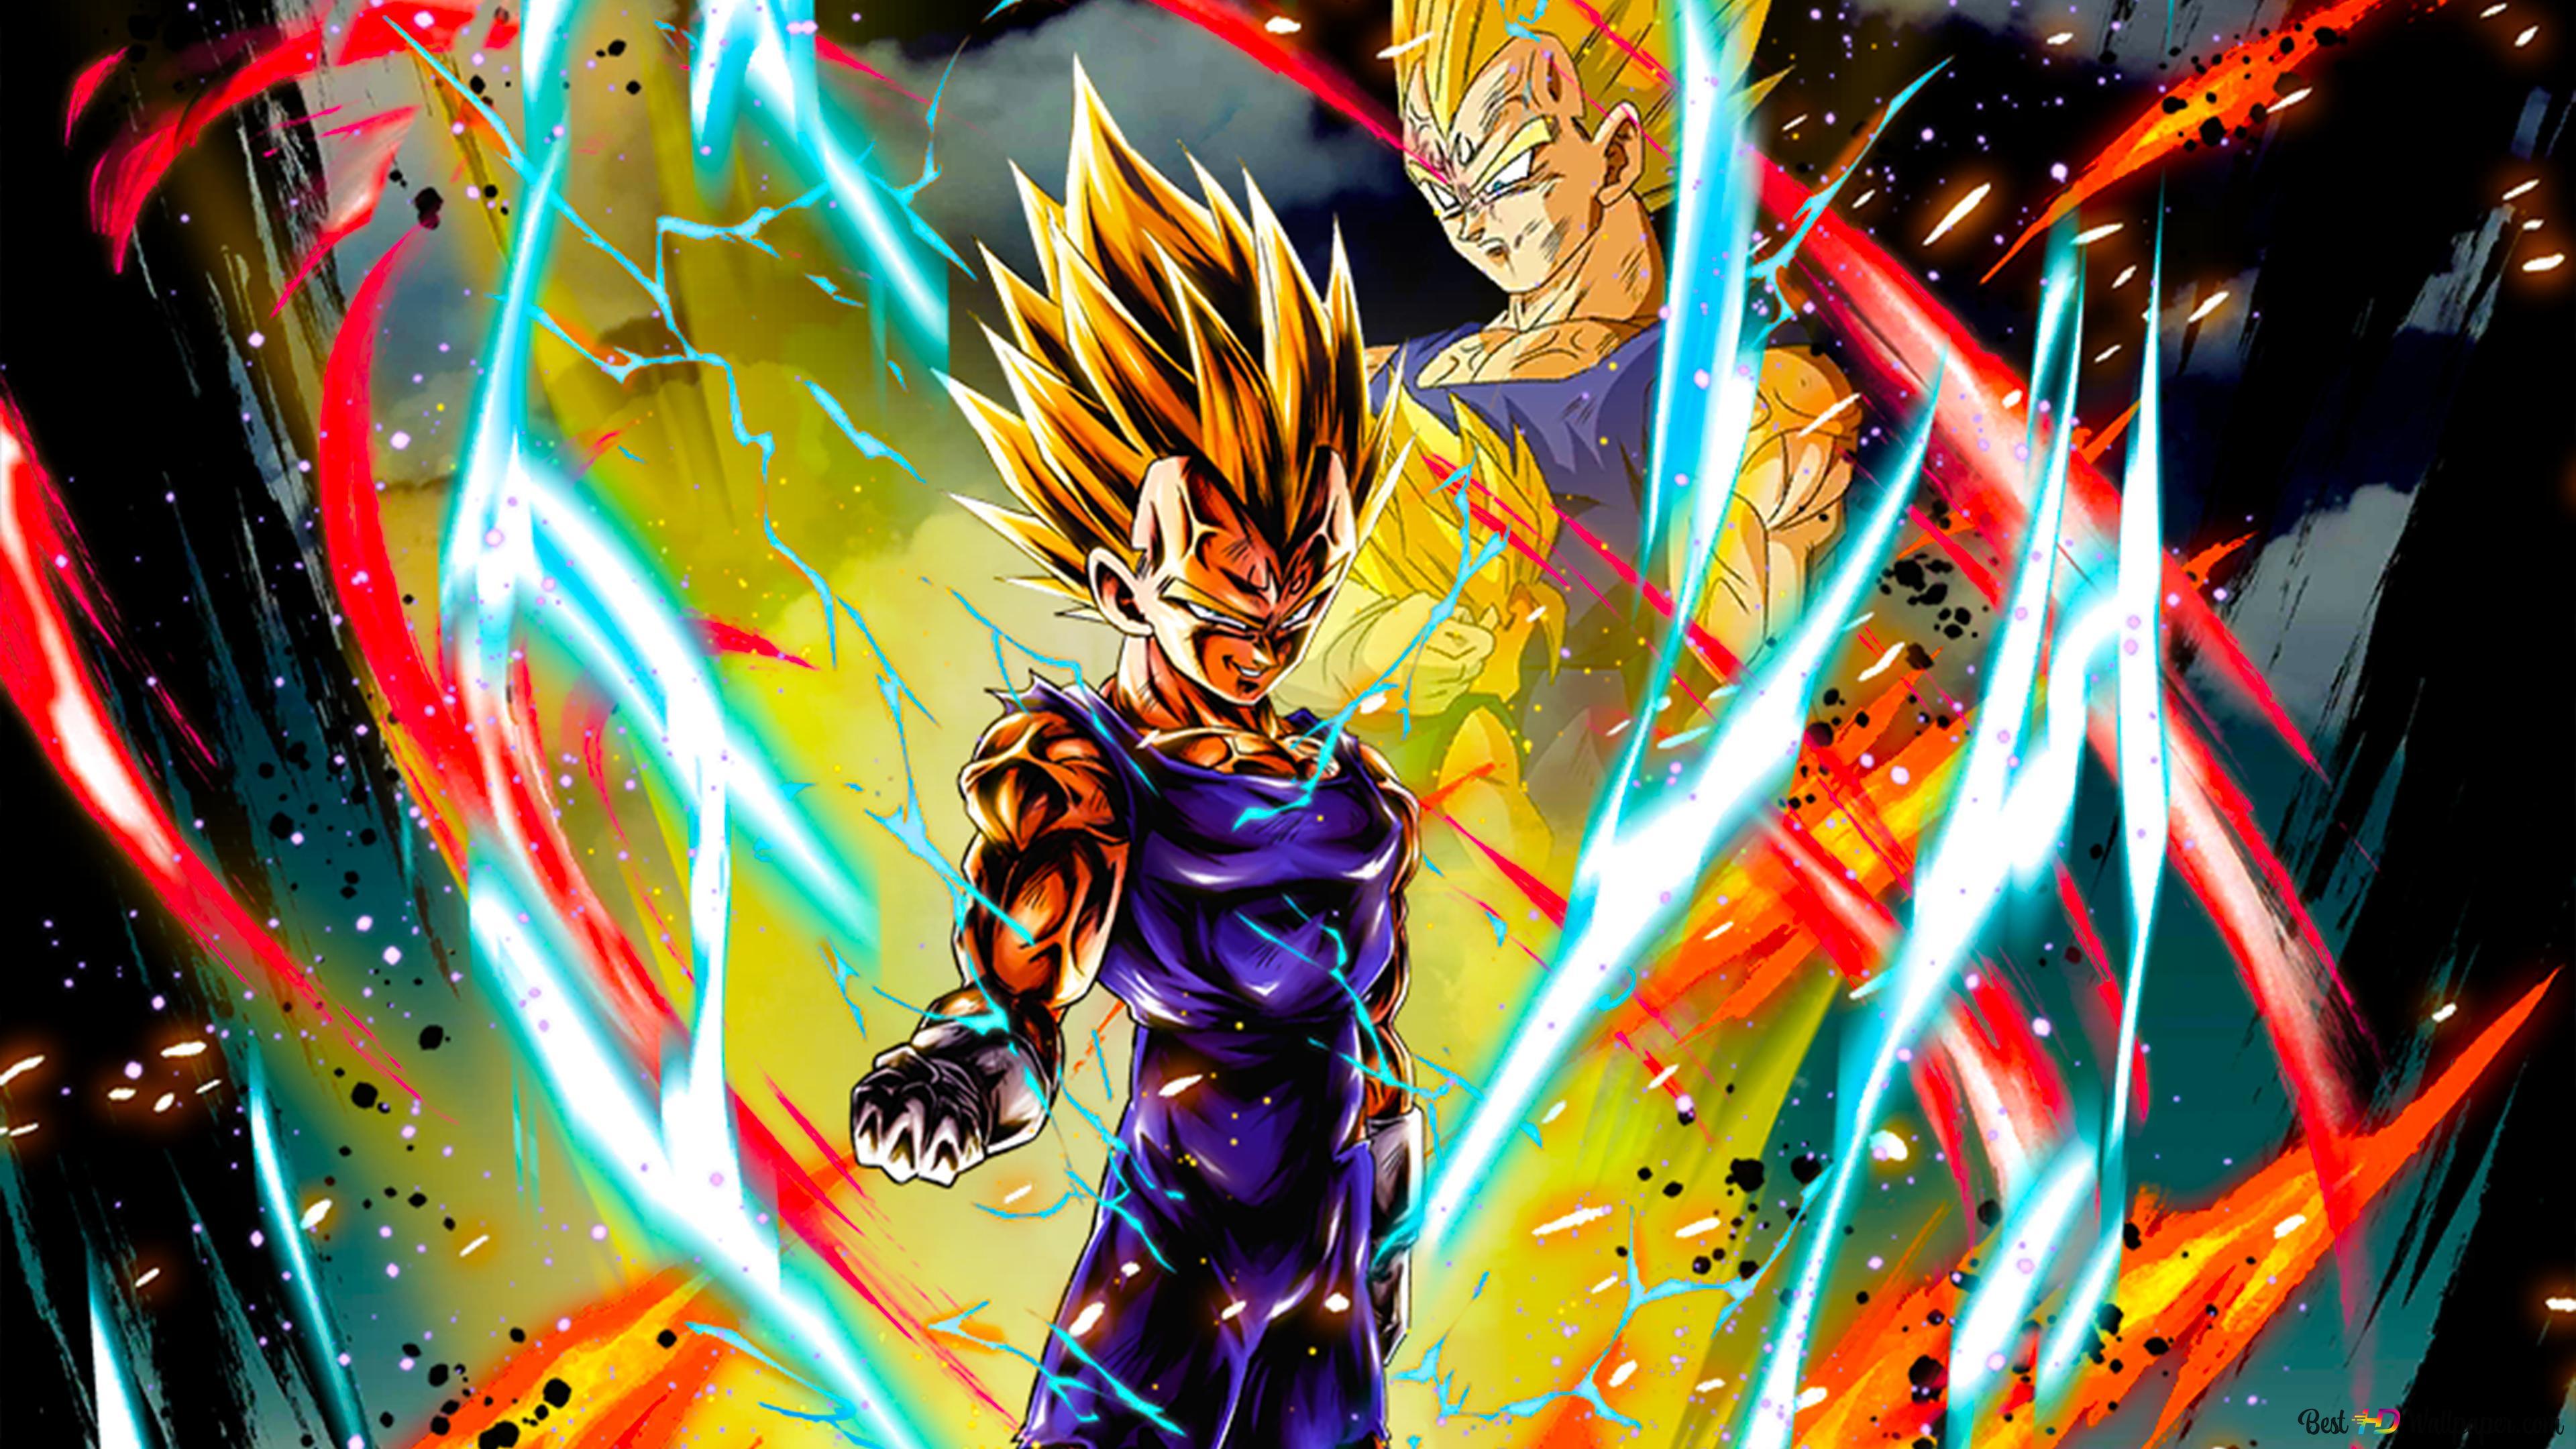 Majin Vegeta Dari Dragon Ball Z Dragon Ball Legends Arts Untuk Desktop Unduhan Wallpaper Hd